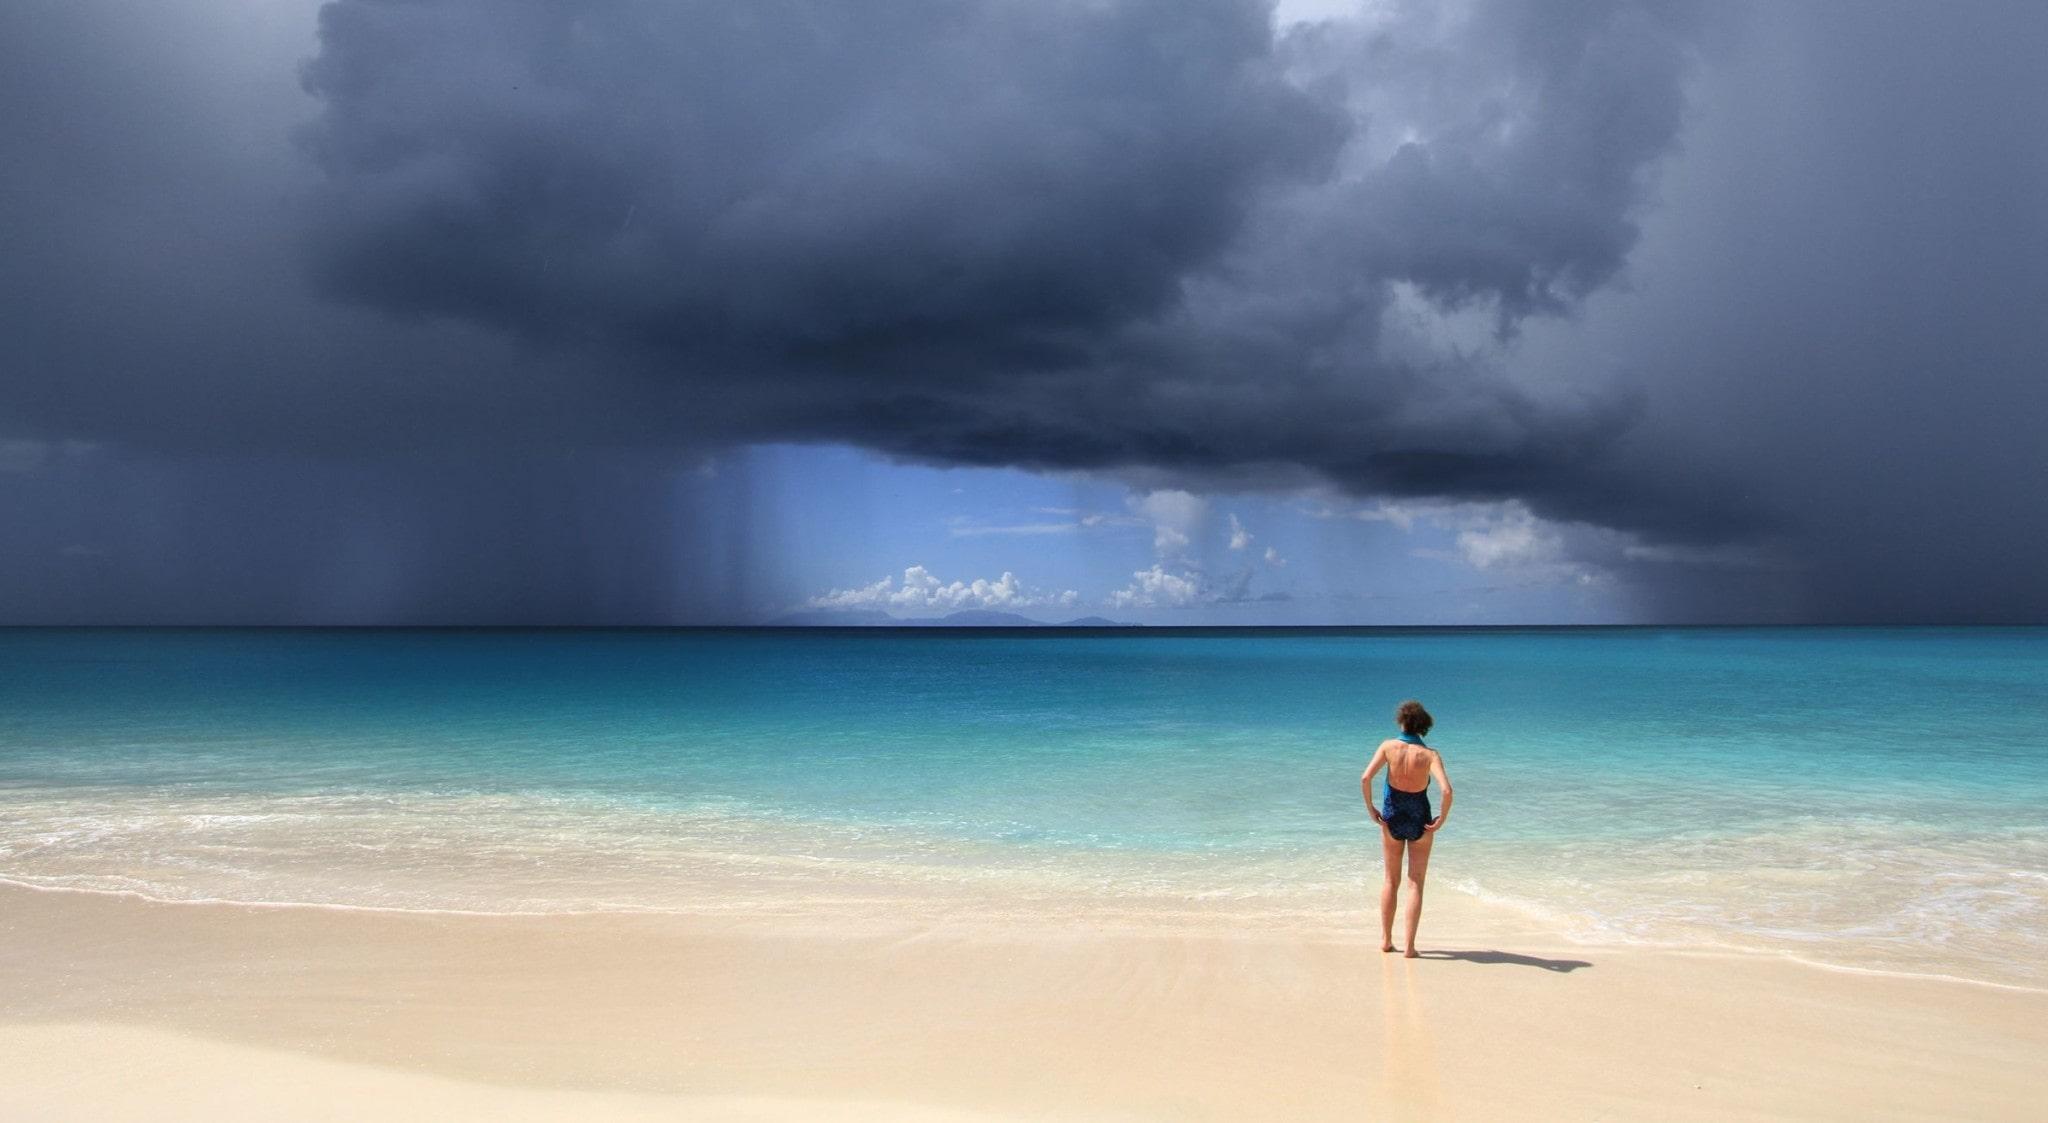 Sunny Shores Immune to Rainy Skies in Antigua